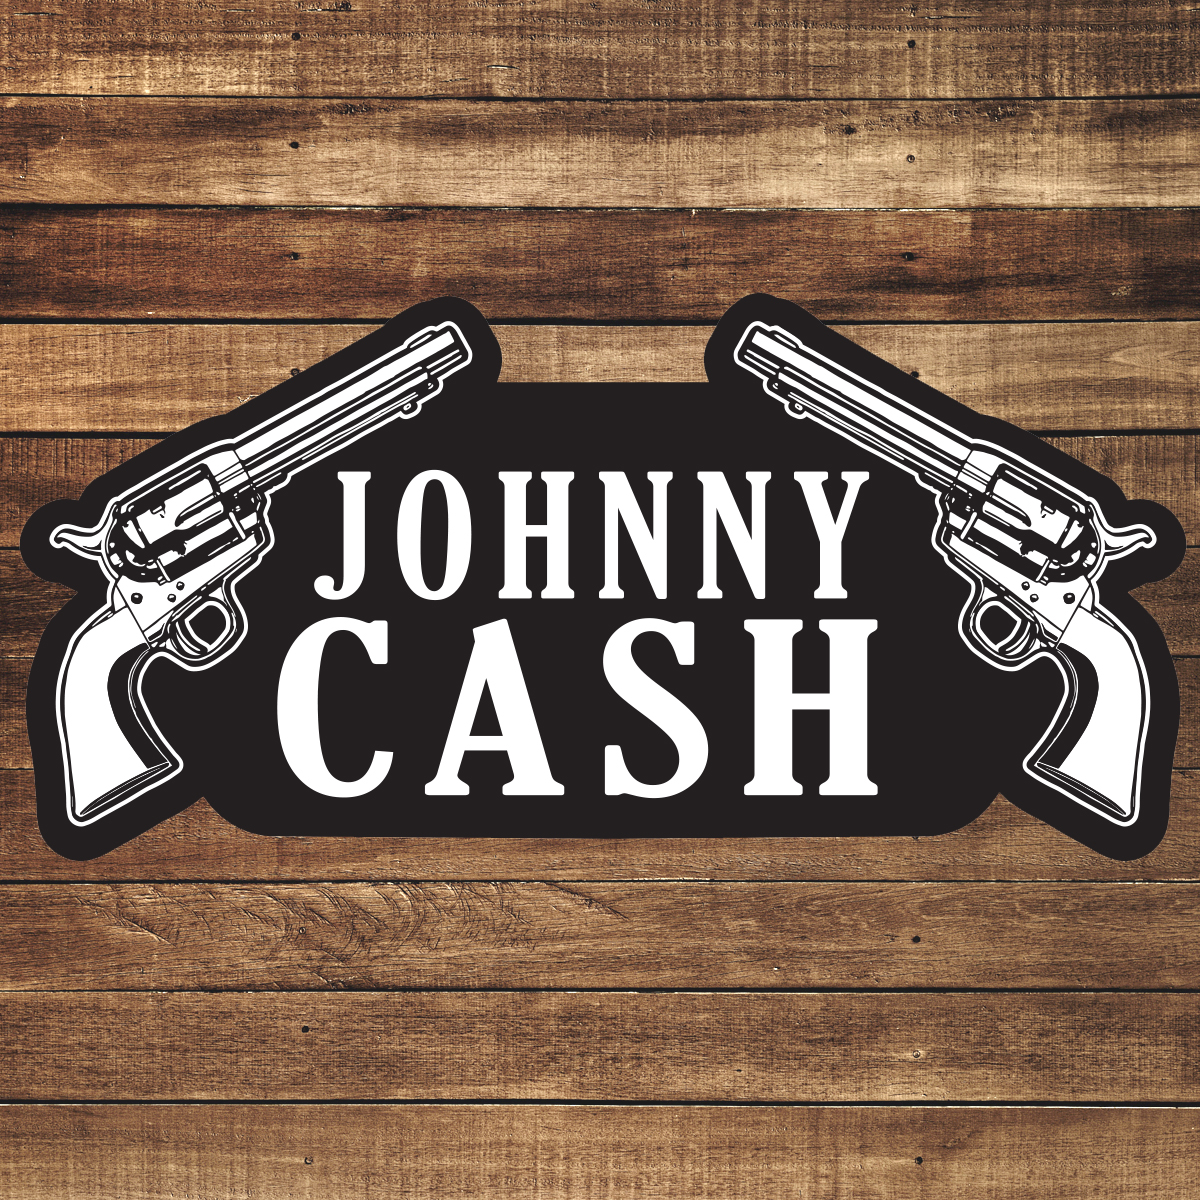 Johnny Cash Two Guns Patch